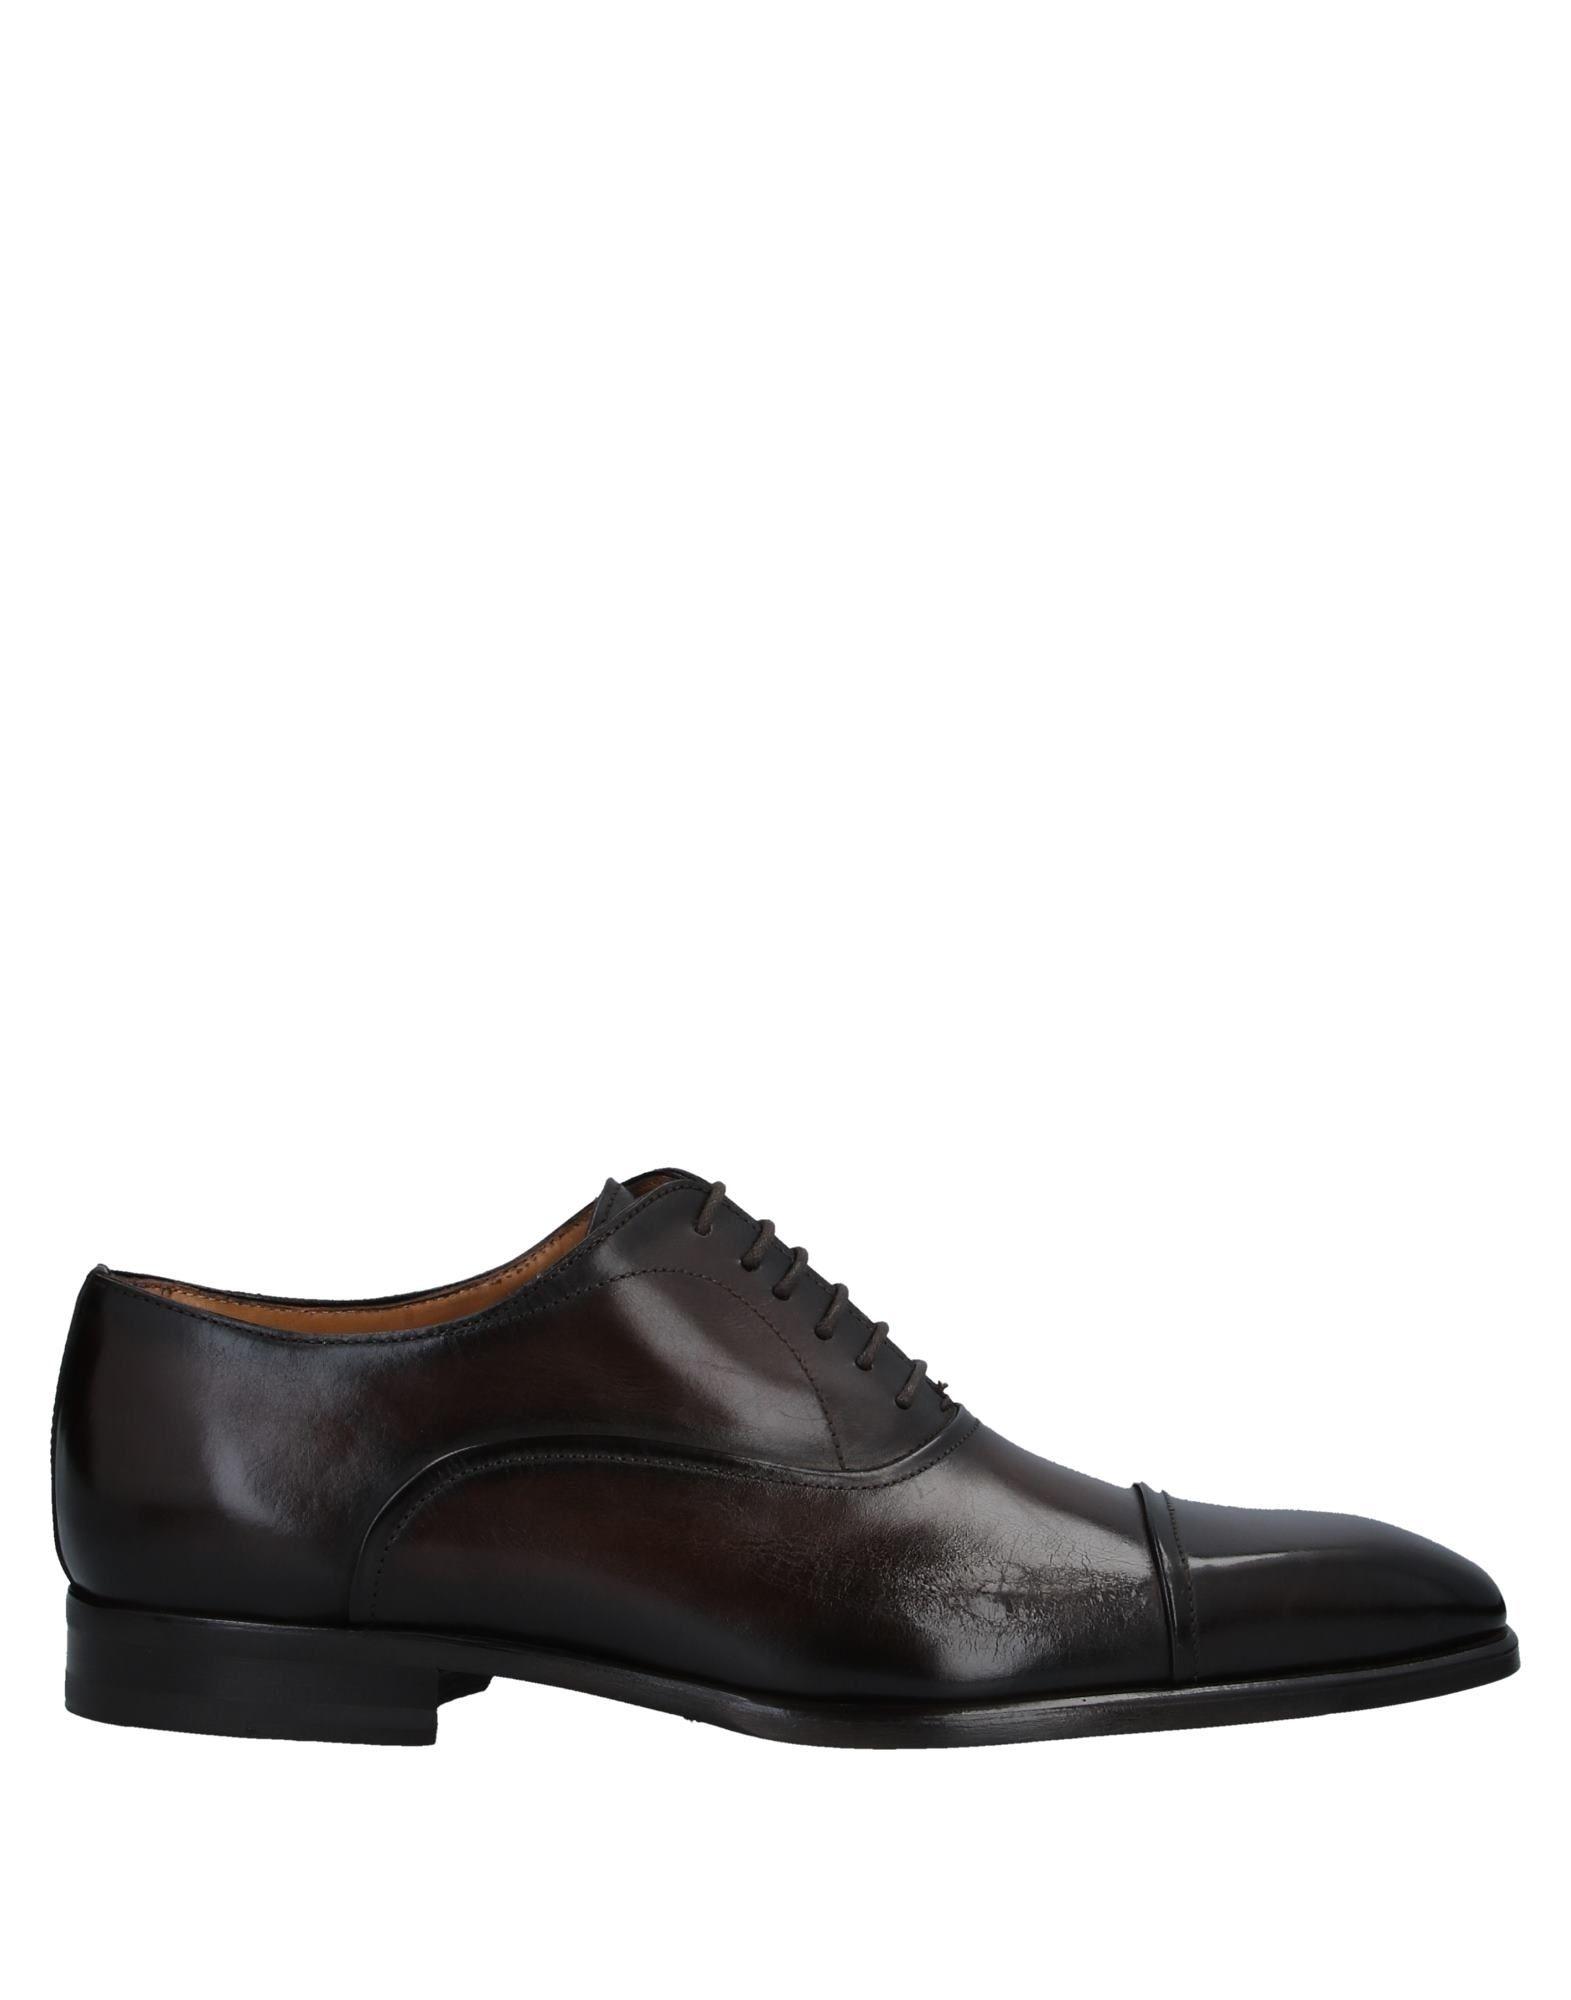 STEFANO BRANCHINI Обувь на шнурках stefano branchini обувь на шнурках